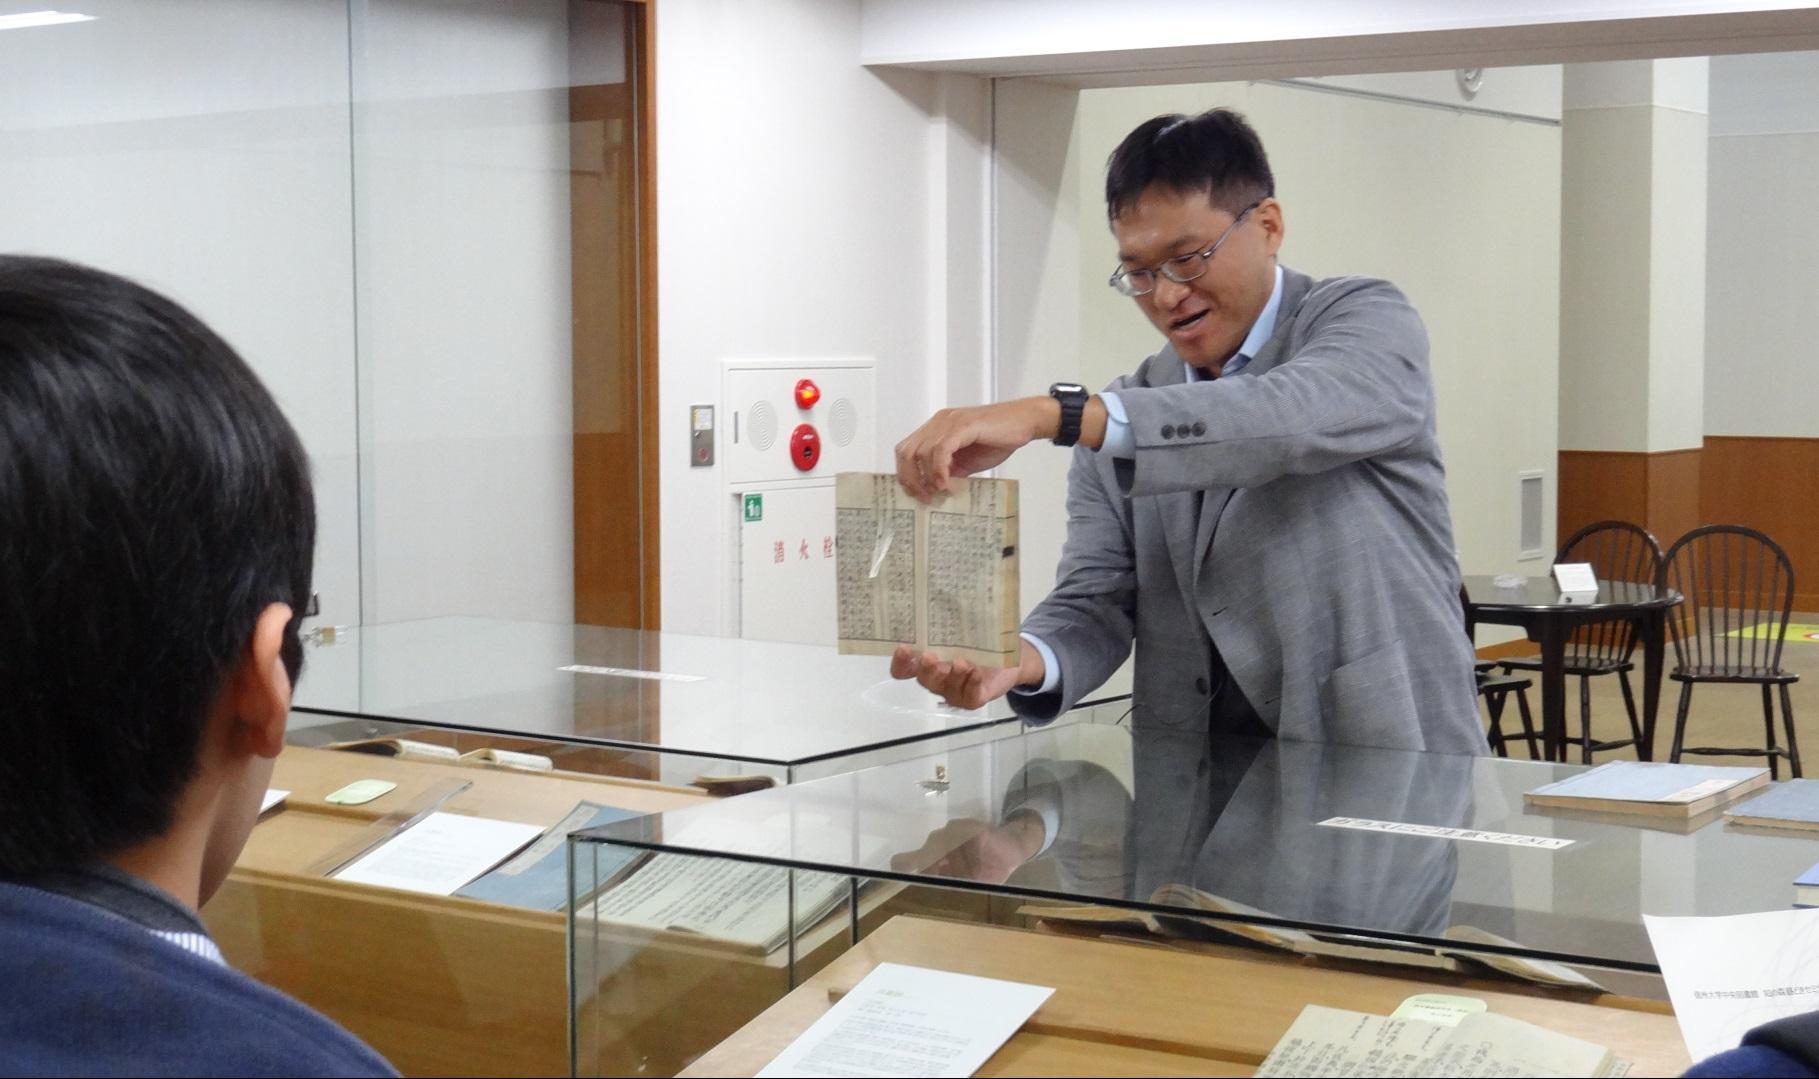 http://www.shinshu-u.ac.jp/institution/library/matsumoto/uploadimg/43ffeee3ffe8390a256b020fbfa39e26.jpg